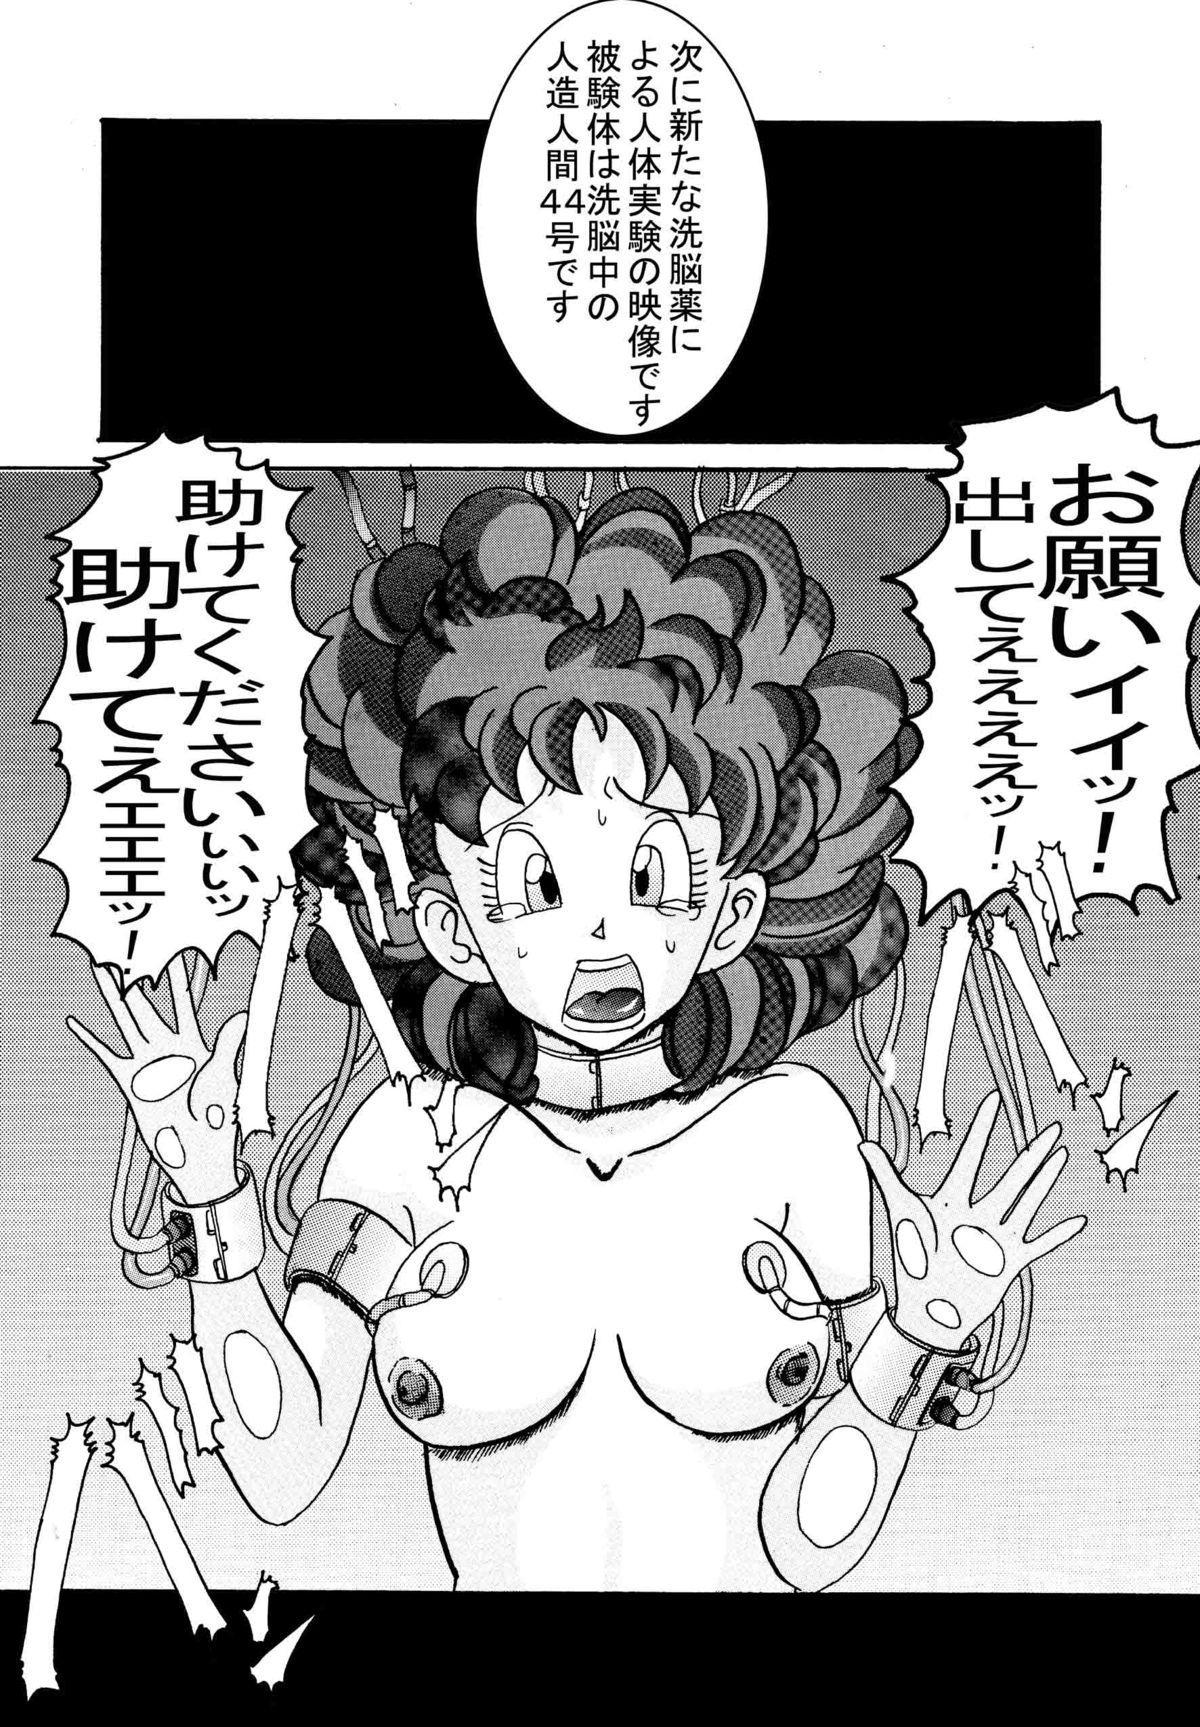 [Light Rate Port Pink] Tanjou!! Aku no Onna Senshi Jinzou Ningen 18-gou Sennou Kaizou Keikaku -Joshou- (Dragon Ball Z) 6